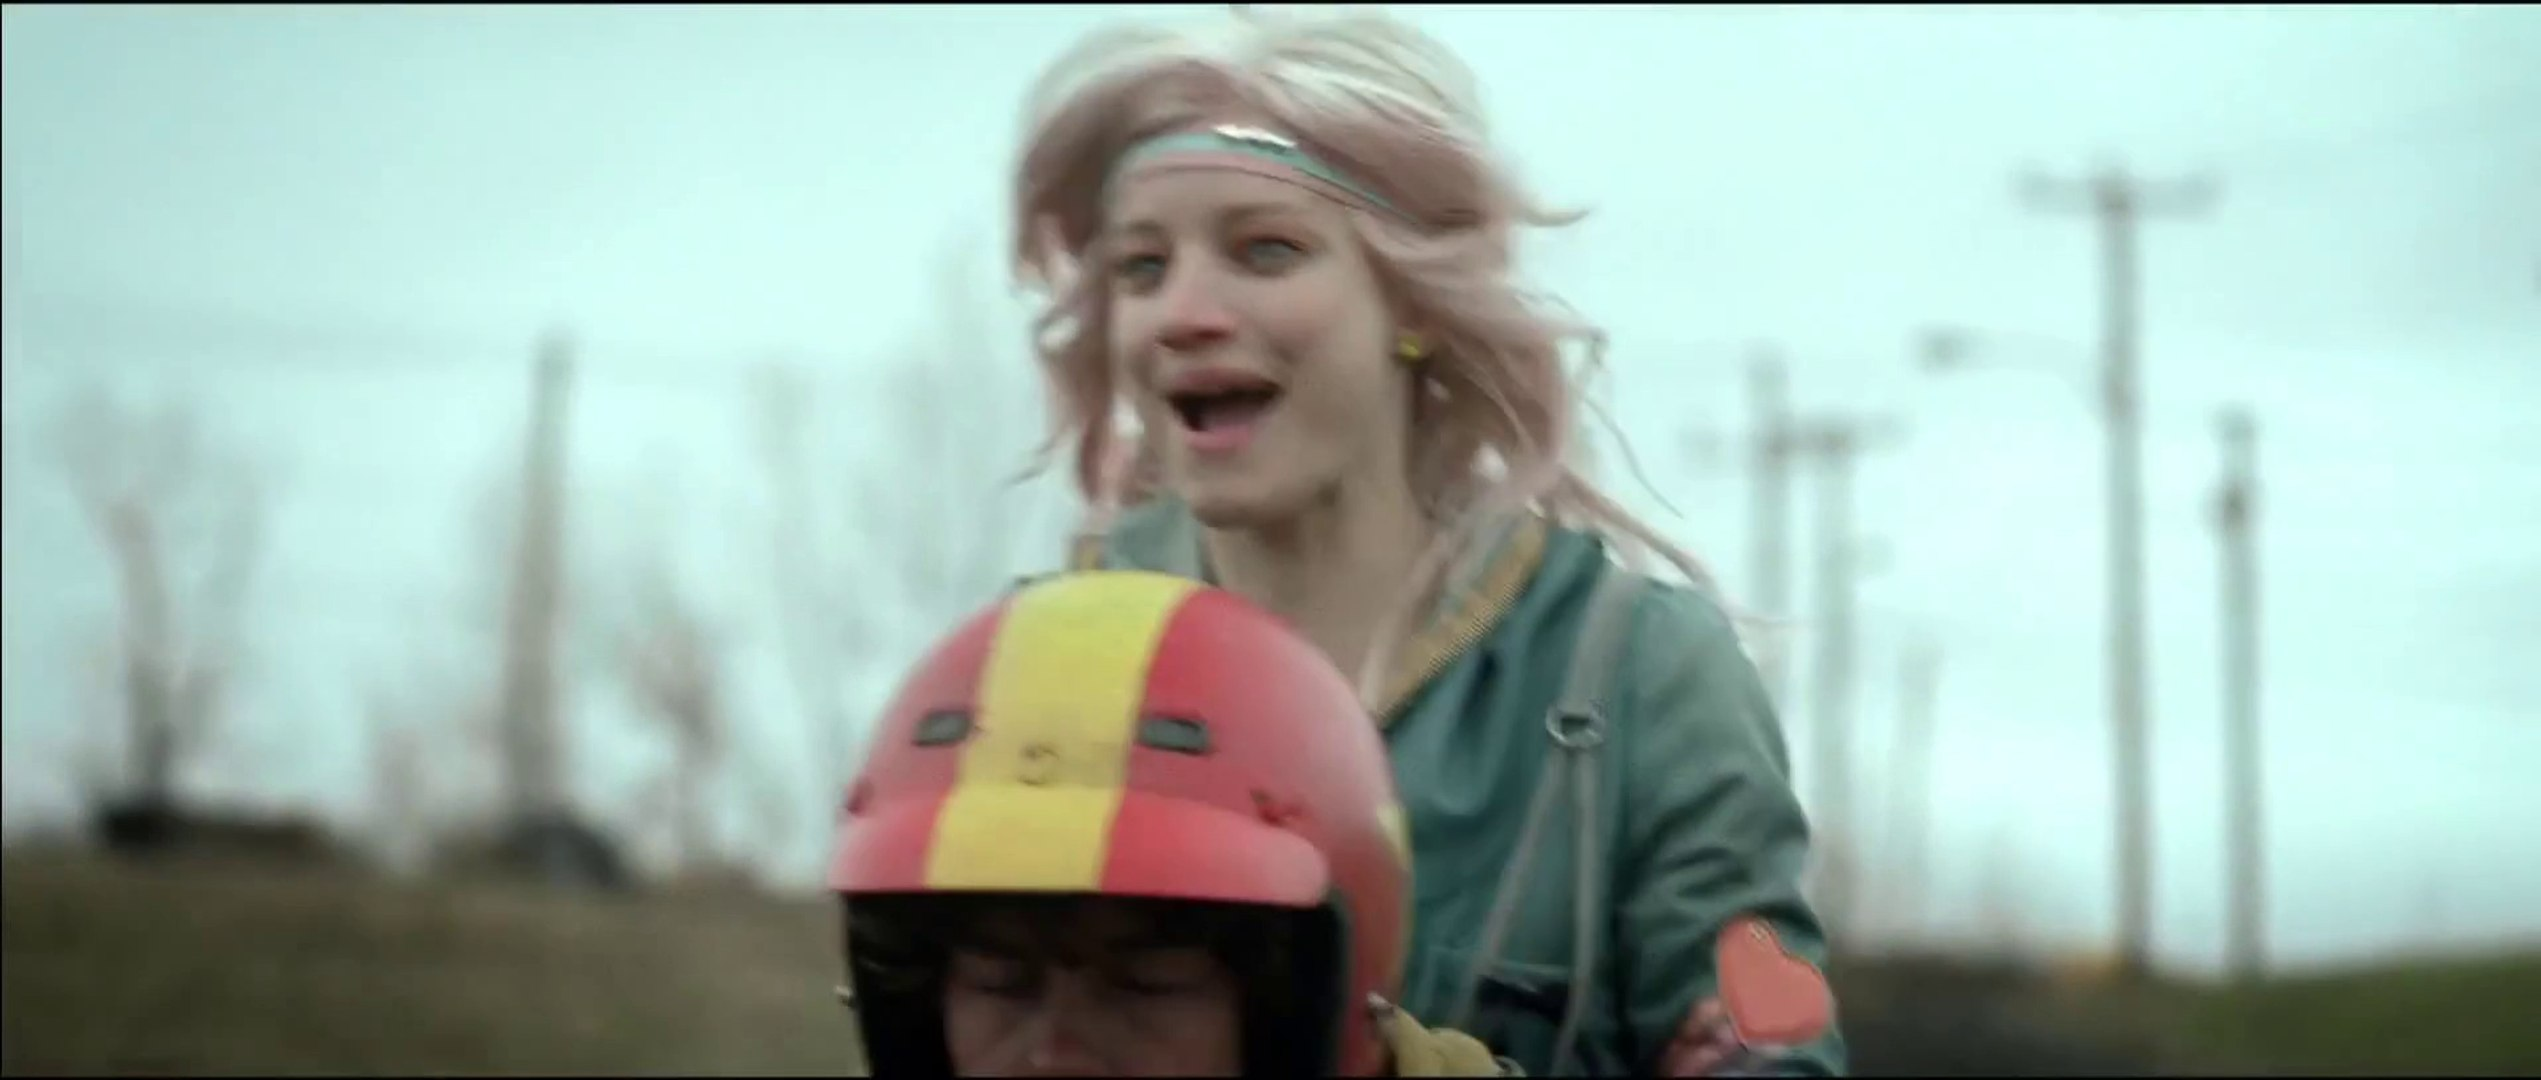 TURBO KID - || Official Trailer Teaser || - Horror Comedy - 2015 - Full HD  -Entertainment CIty